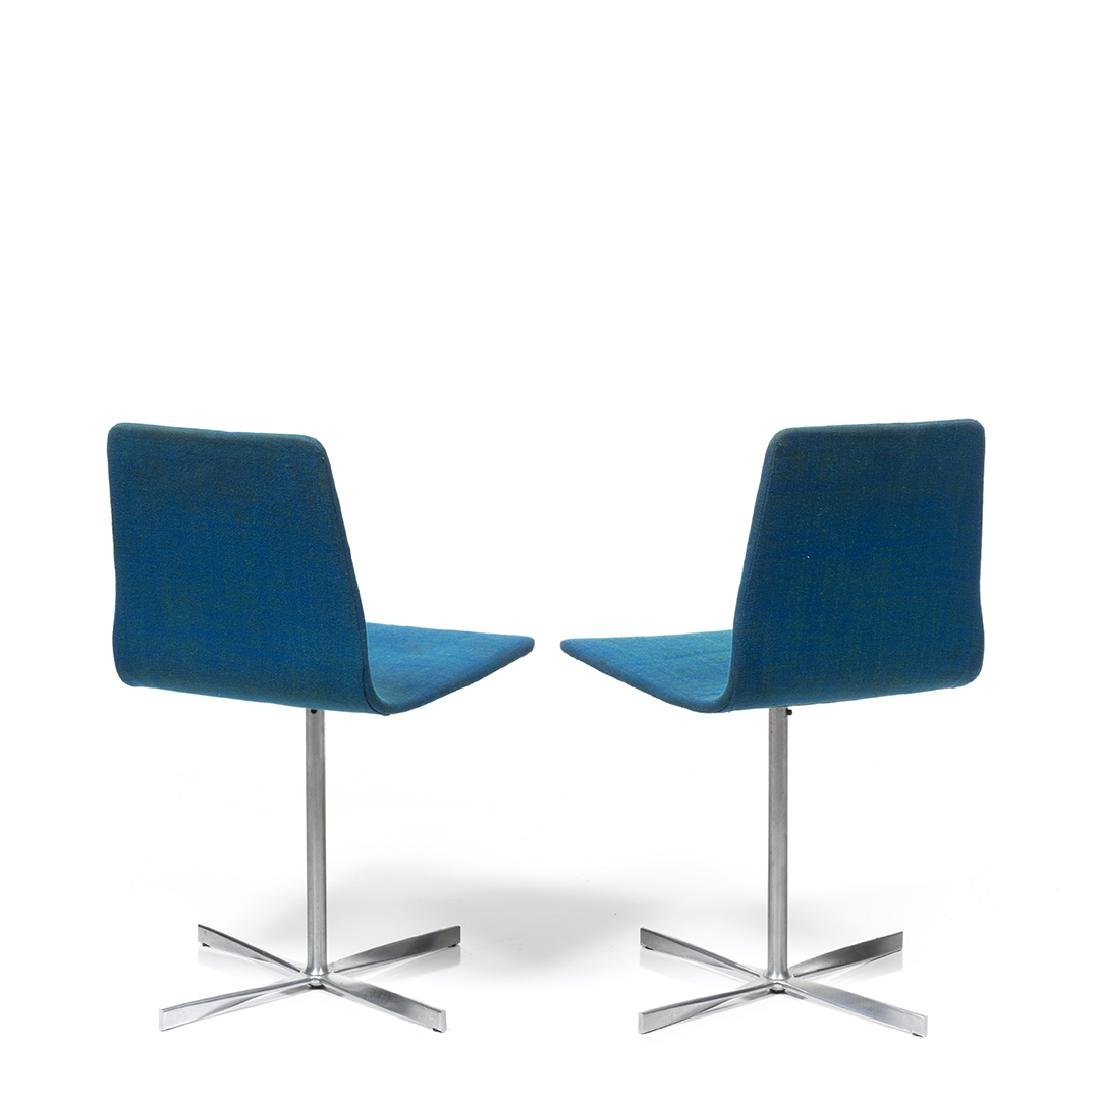 Danish Side Chairs - 2